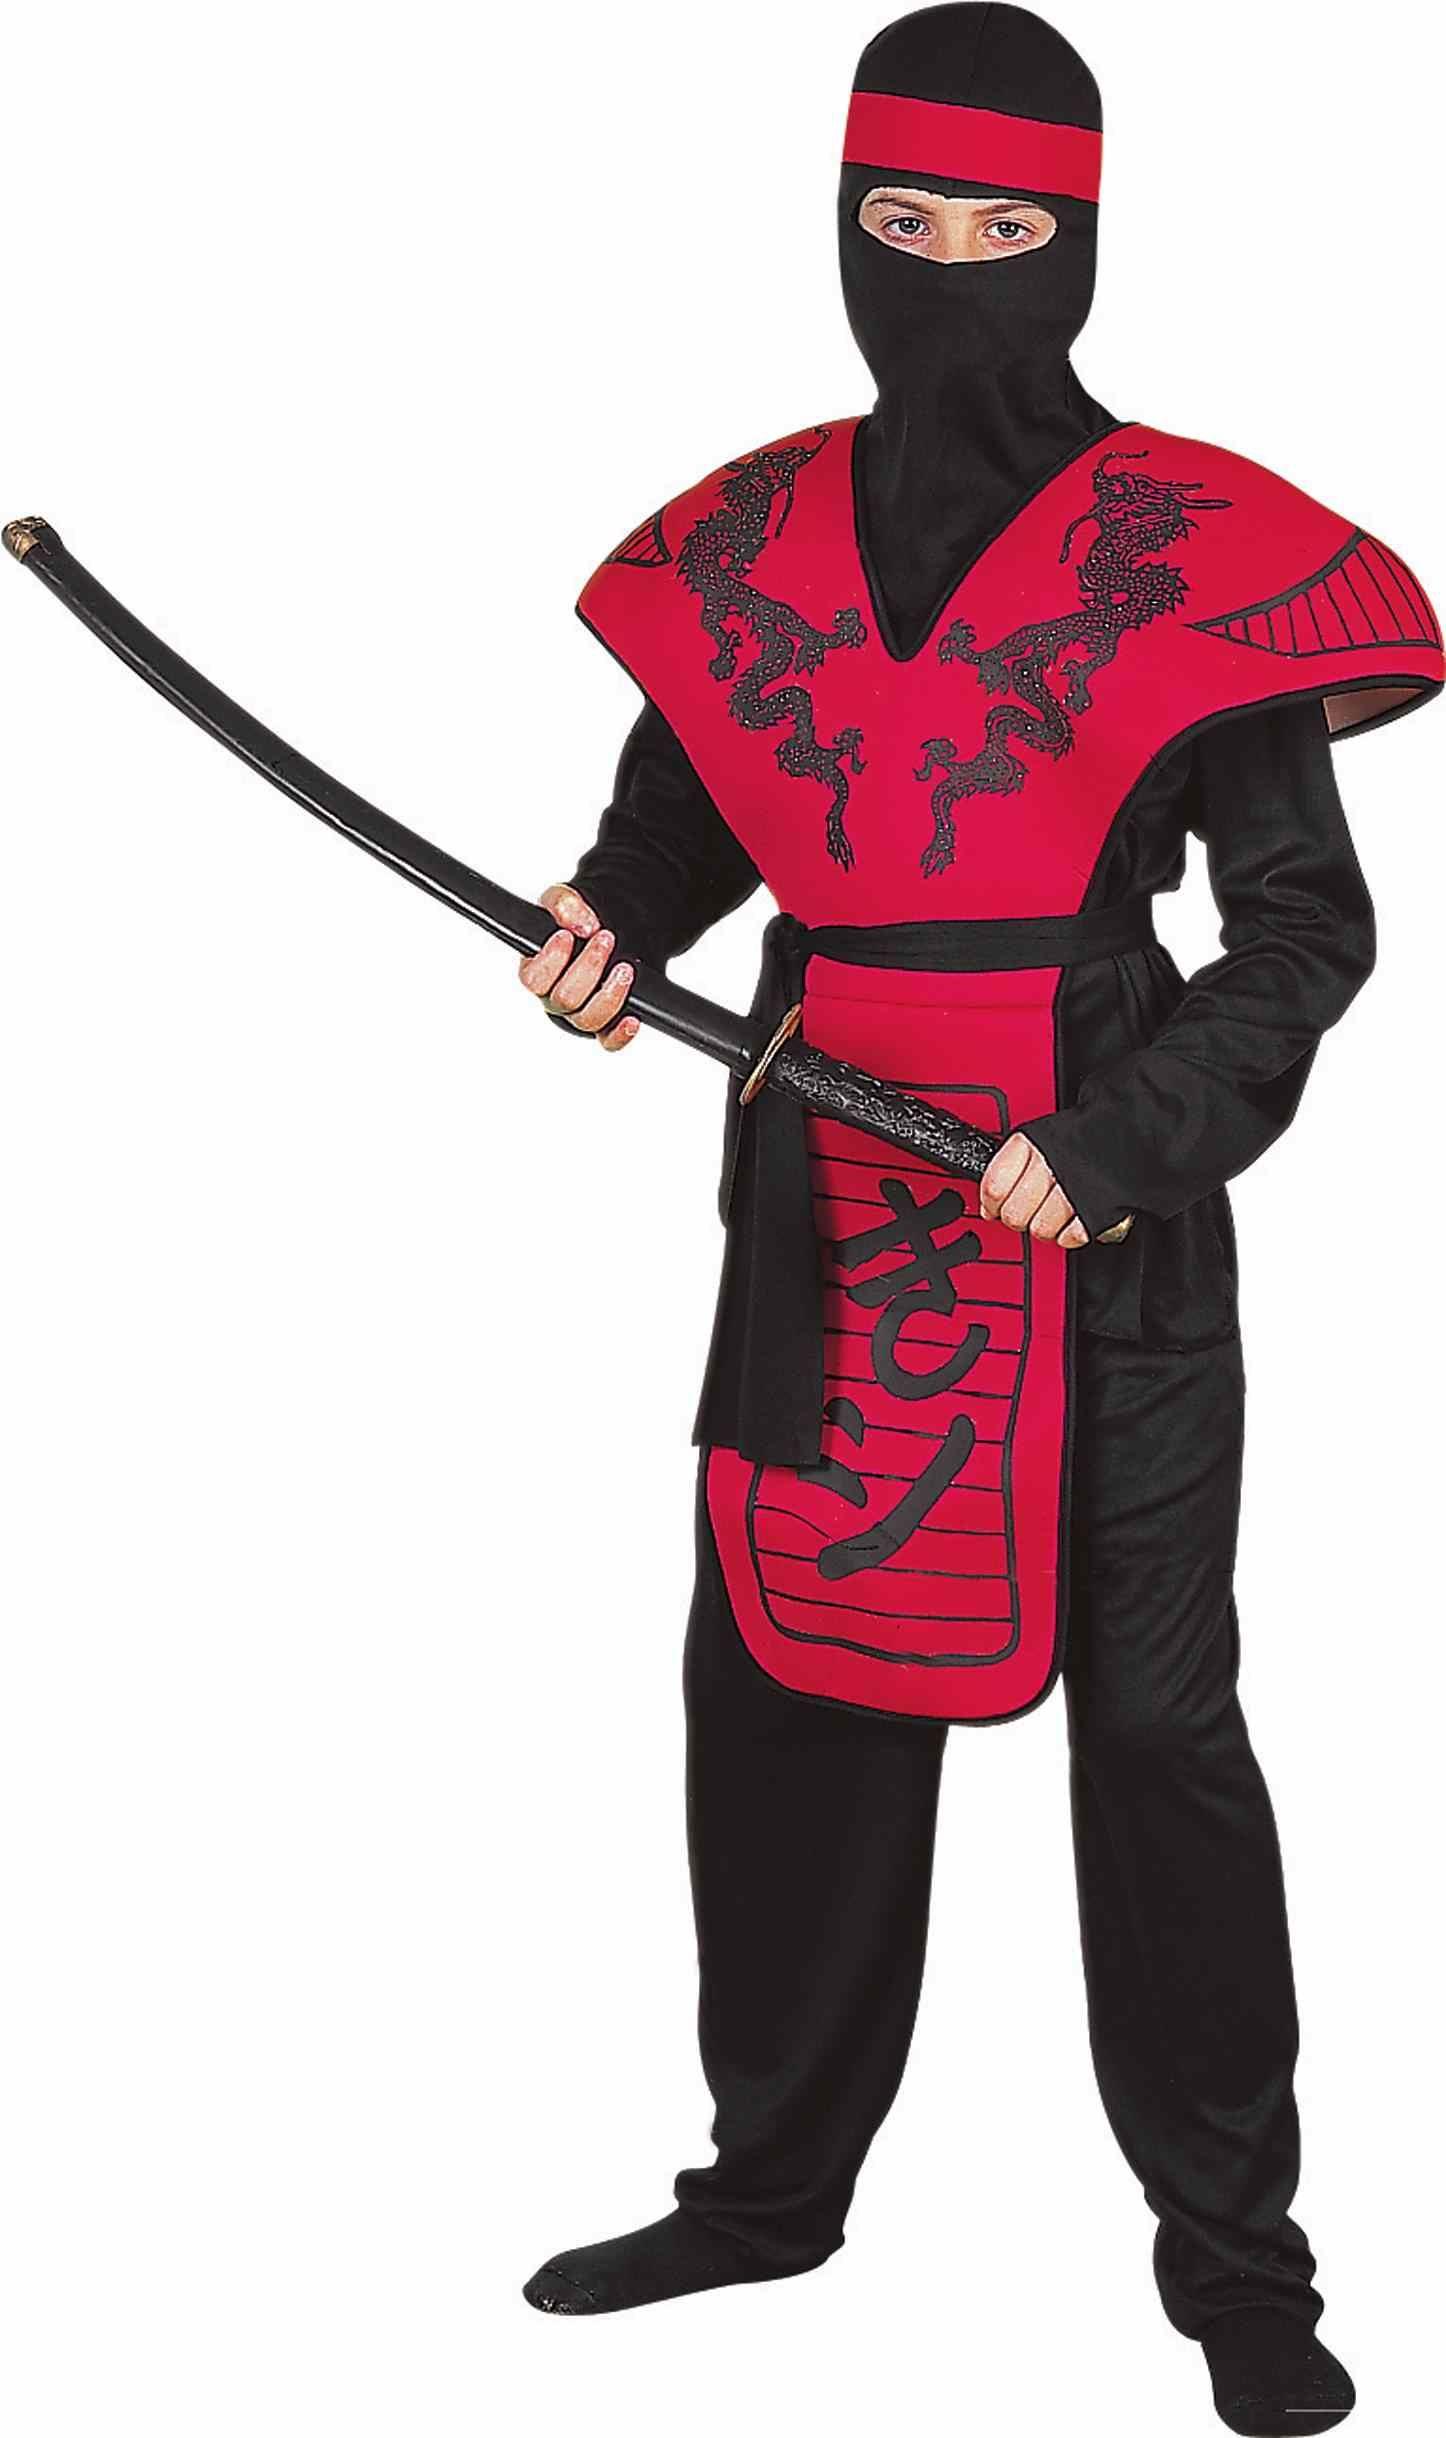 Kids Dragon Ninja Warrior Boys Costume | $29.99 | The Costume Land